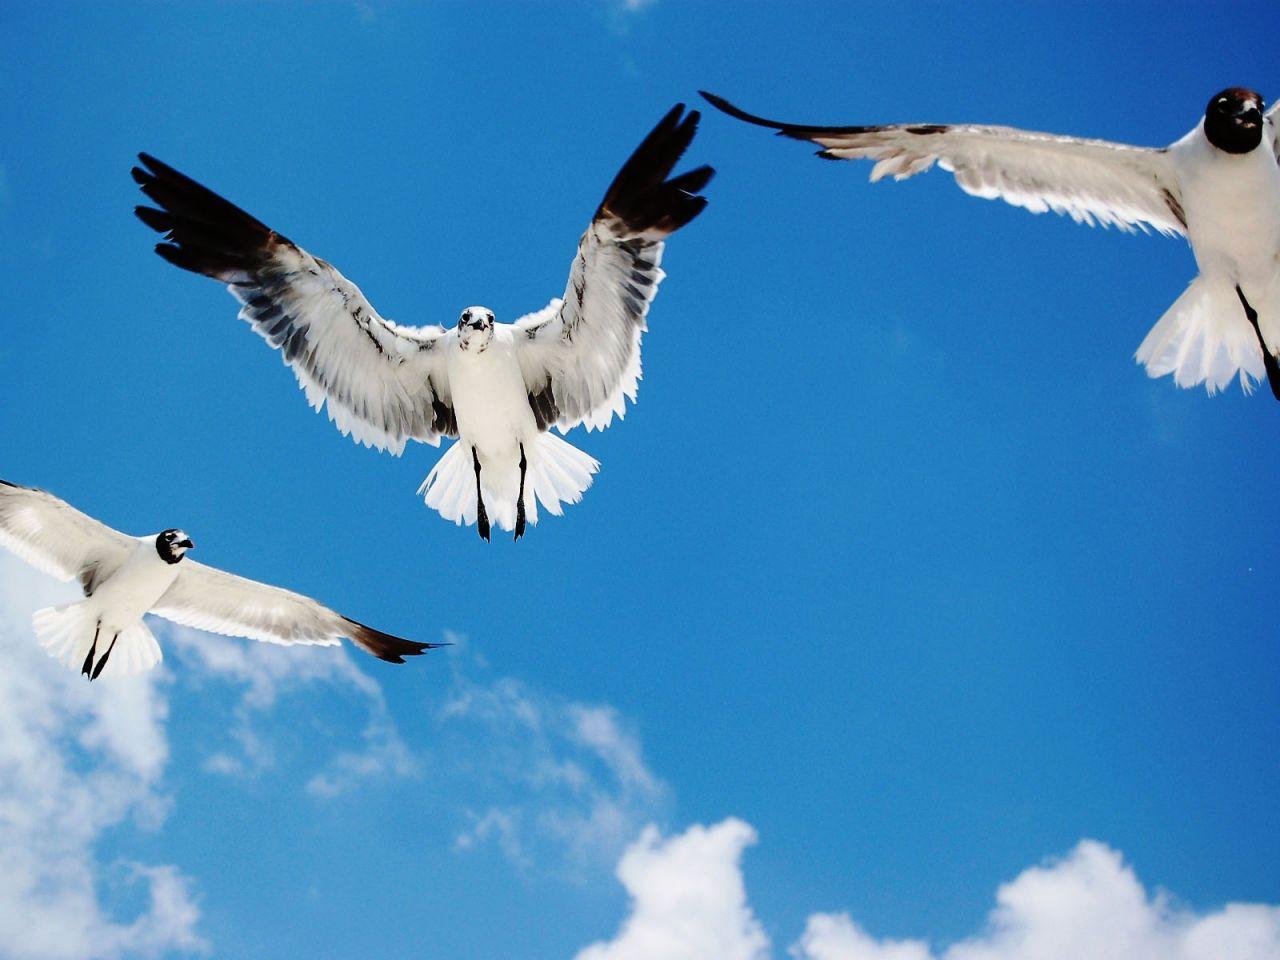 Birds Flying In The Sky Wallpaper 1280x960